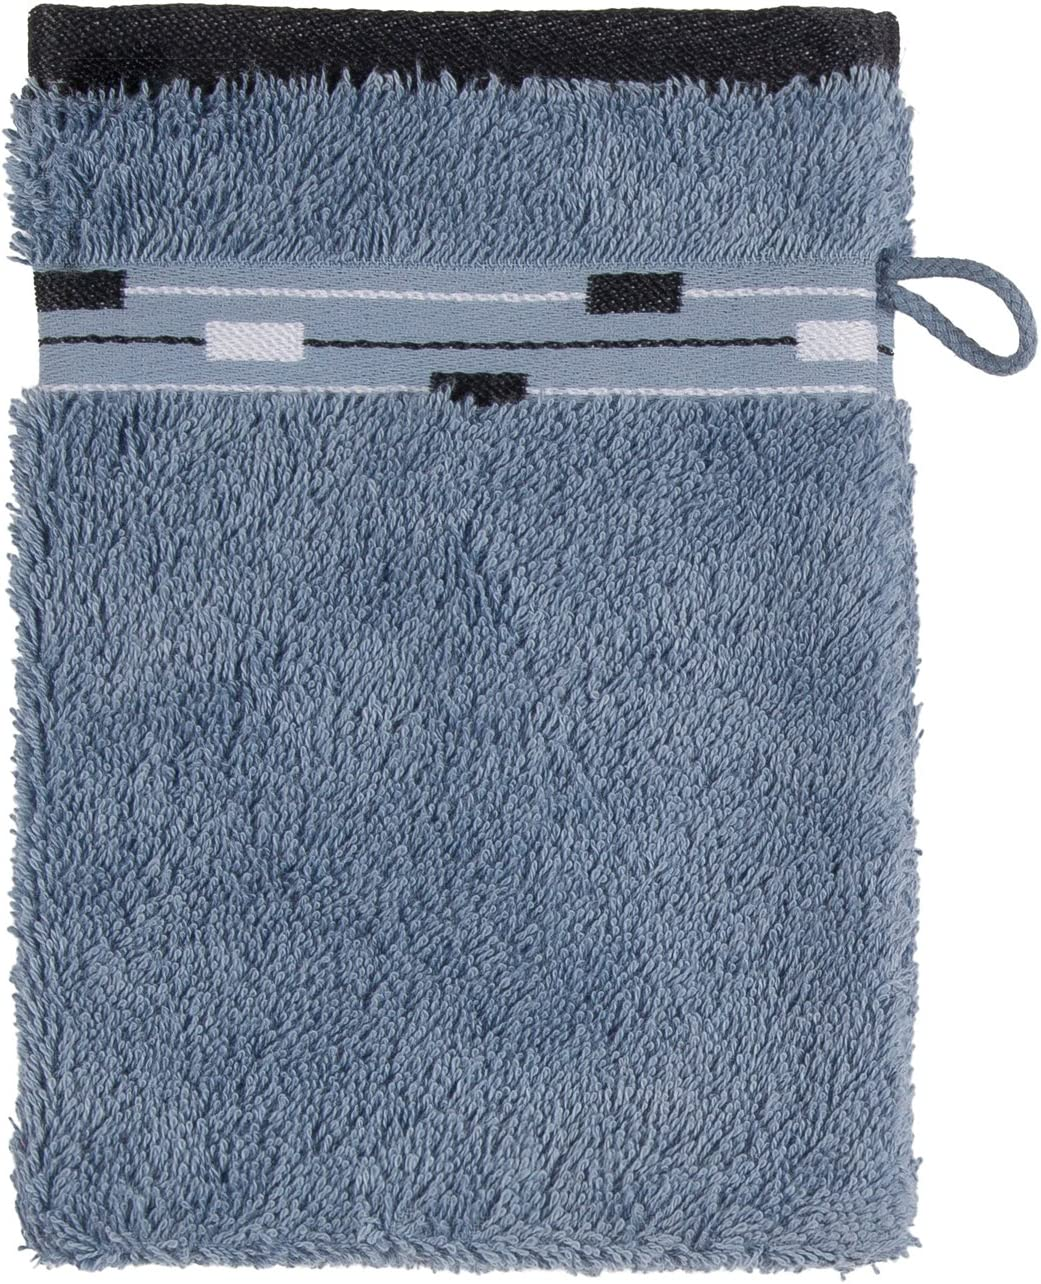 Frottana Magic Manopla de baño, algodón, Blaustone, 20 x 15 cm ...